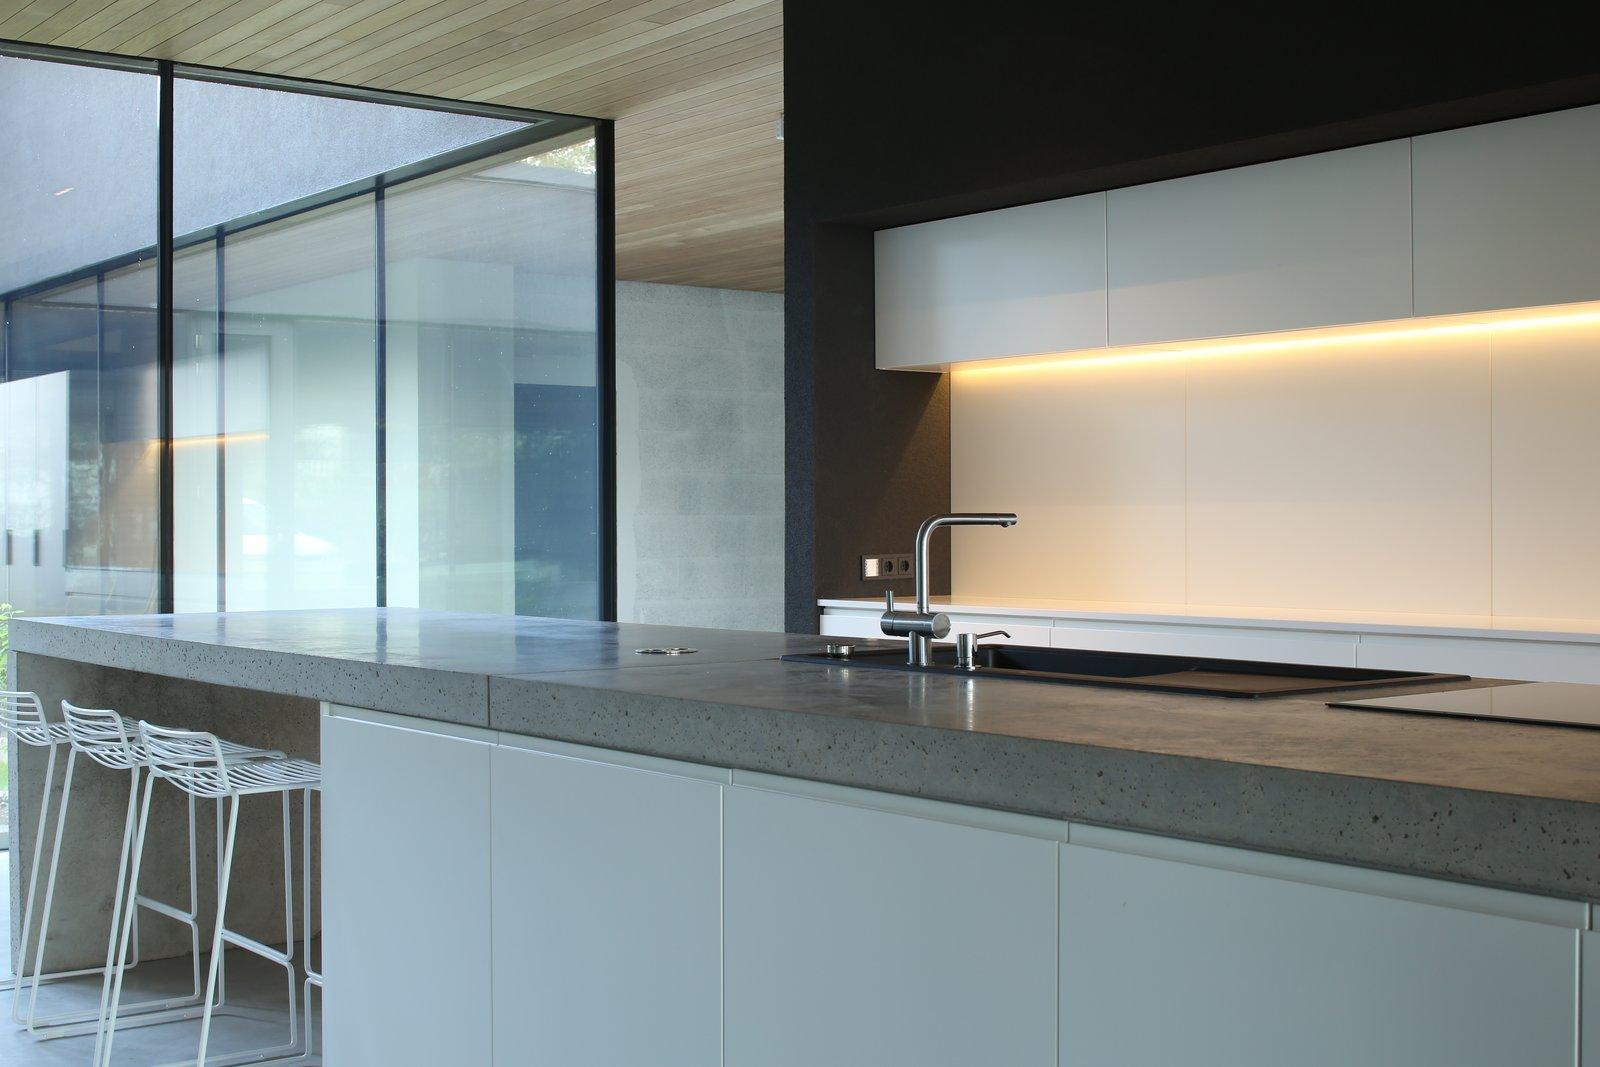 Open kitchen with view to the atrium and cherry trees   Karhusaari by Alvardag